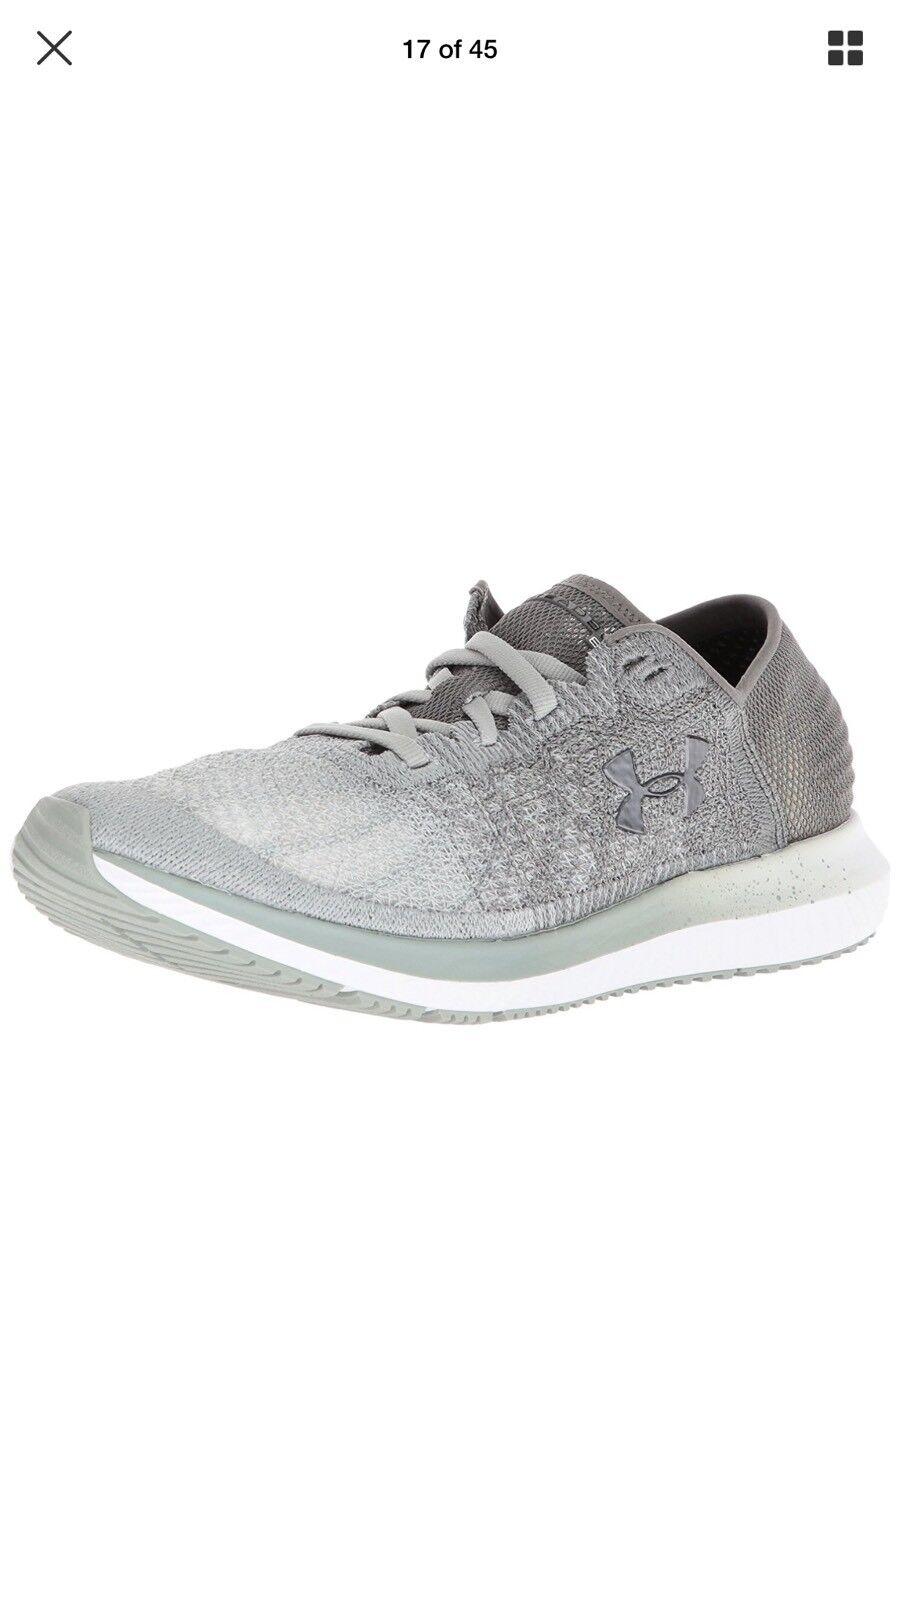 Under Armour UA Threadborne Blur Steel/Grey Running Shoes 2018 3000098-302 Size7